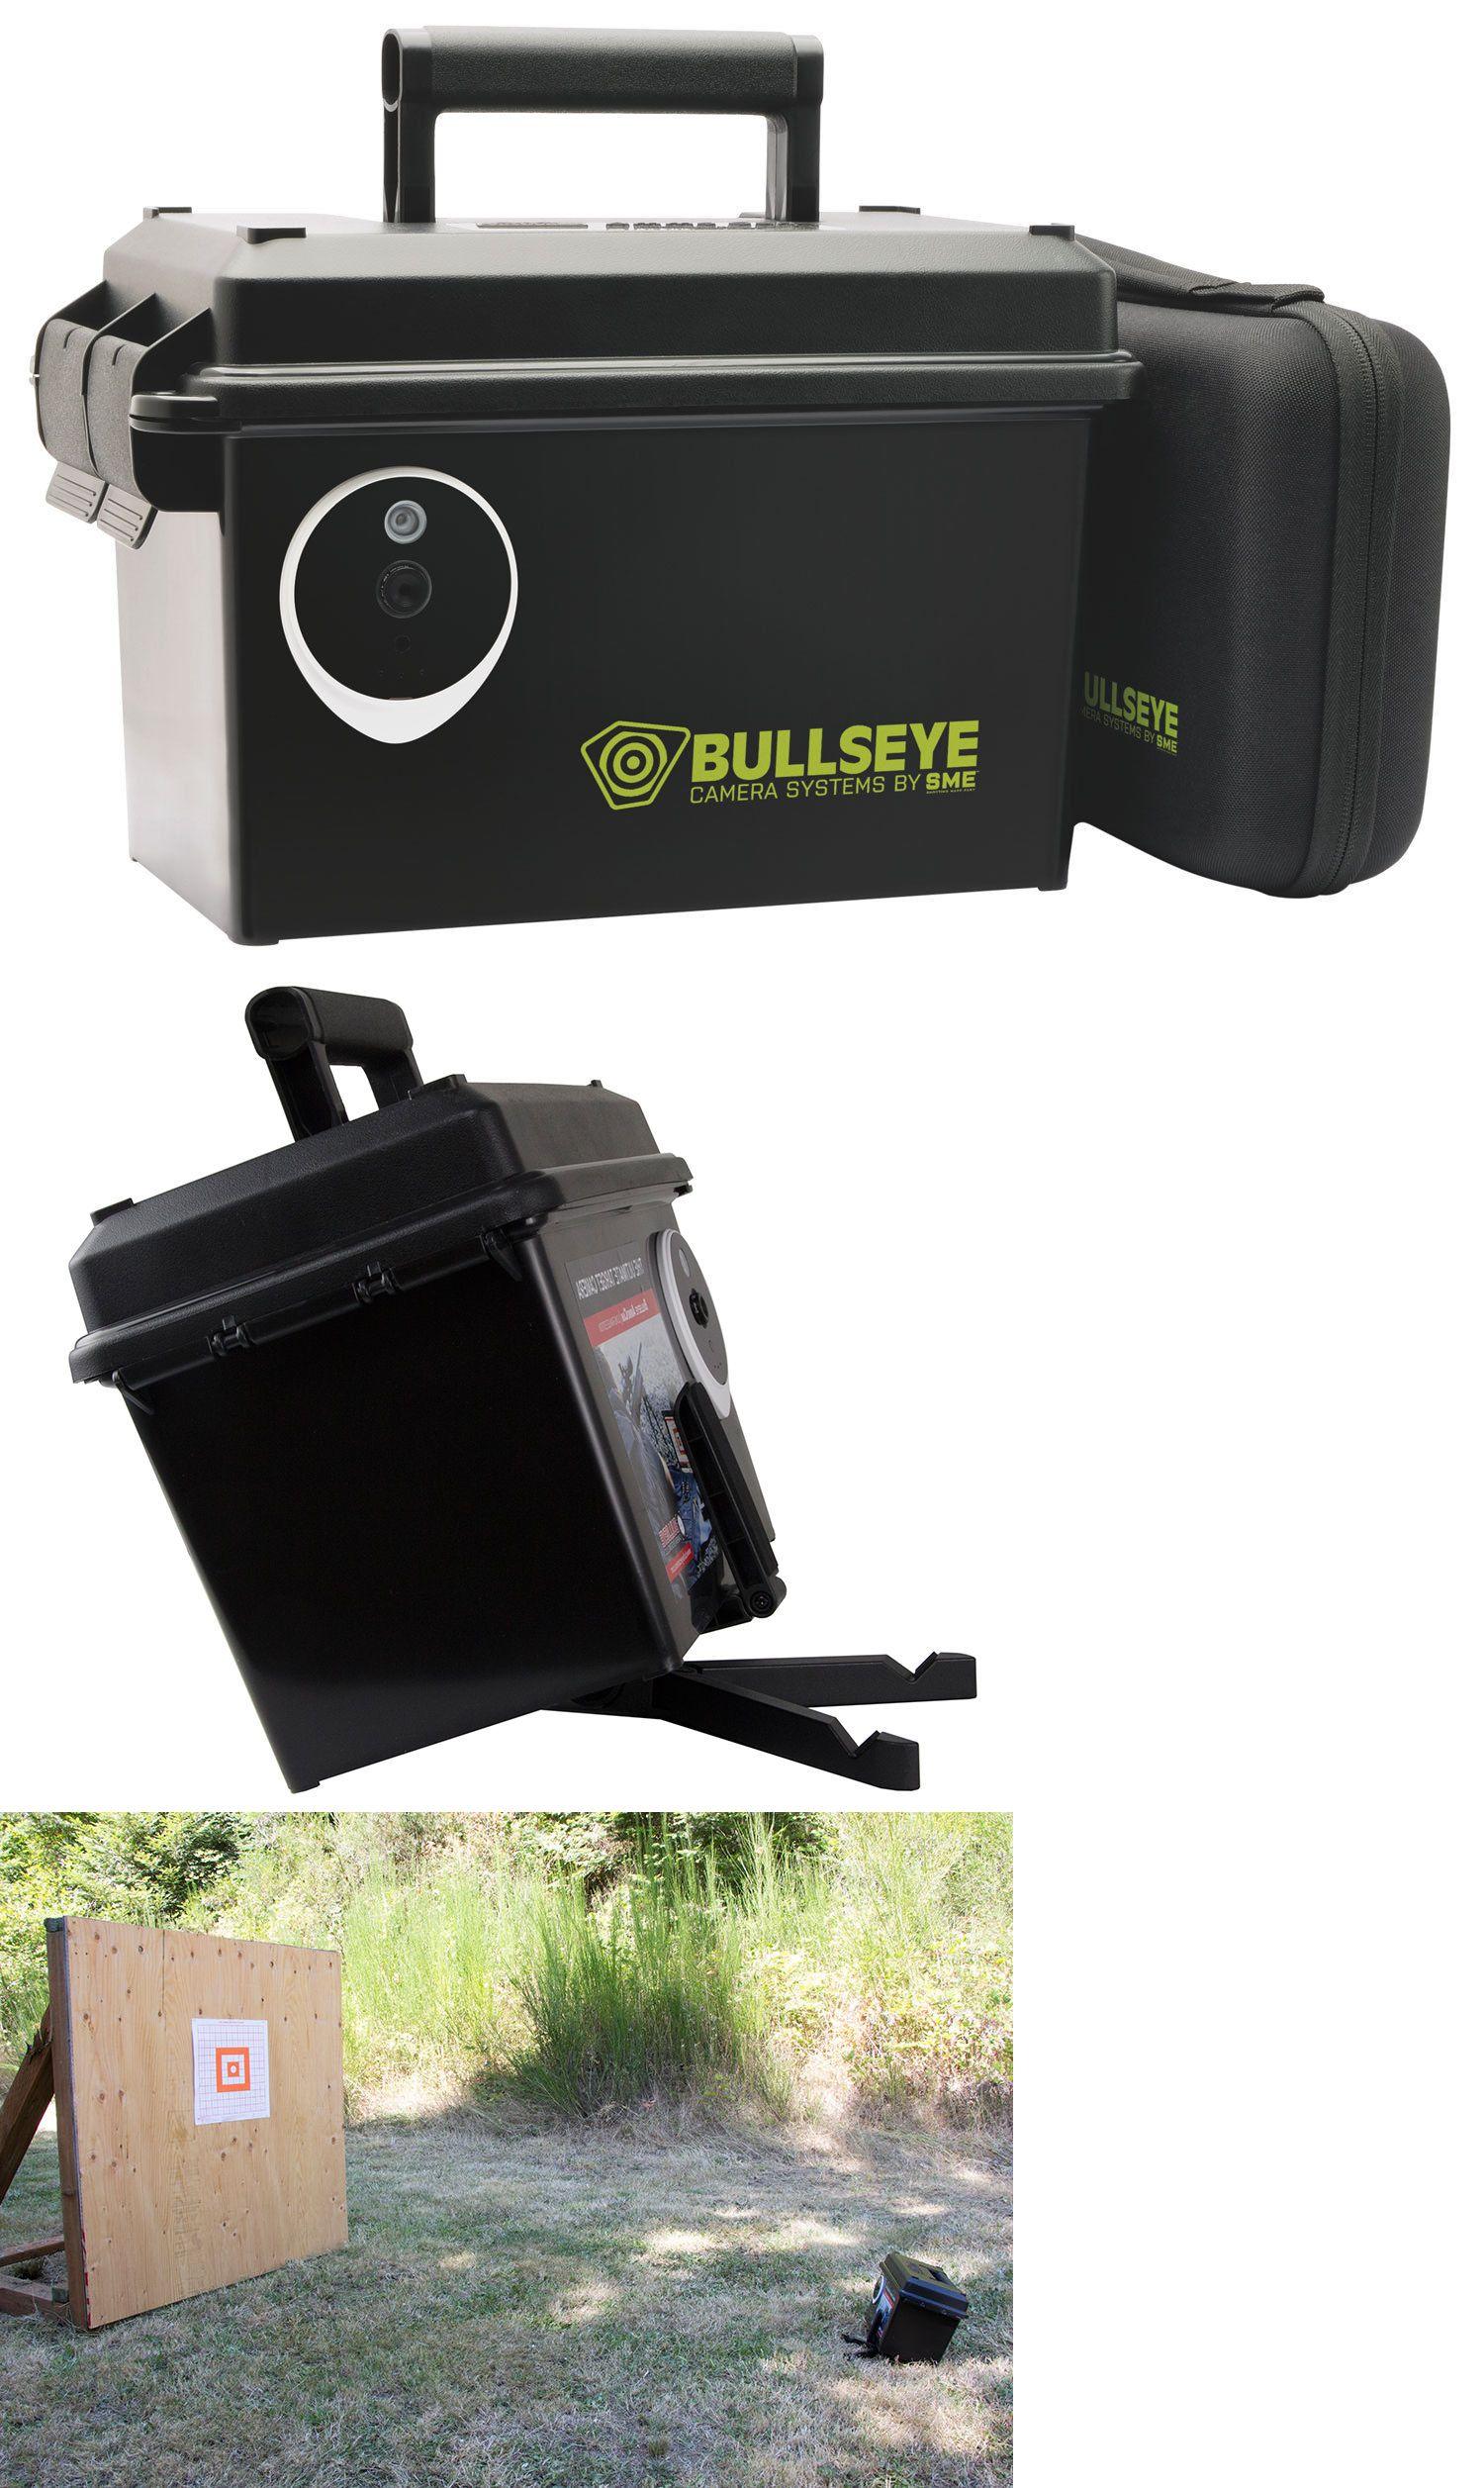 Targets 73978: Bullseye Ammocam Long Range Edition Target Display Camera System Smebullseyel -> BUY IT NOW ONLY: $524.23 on eBay!